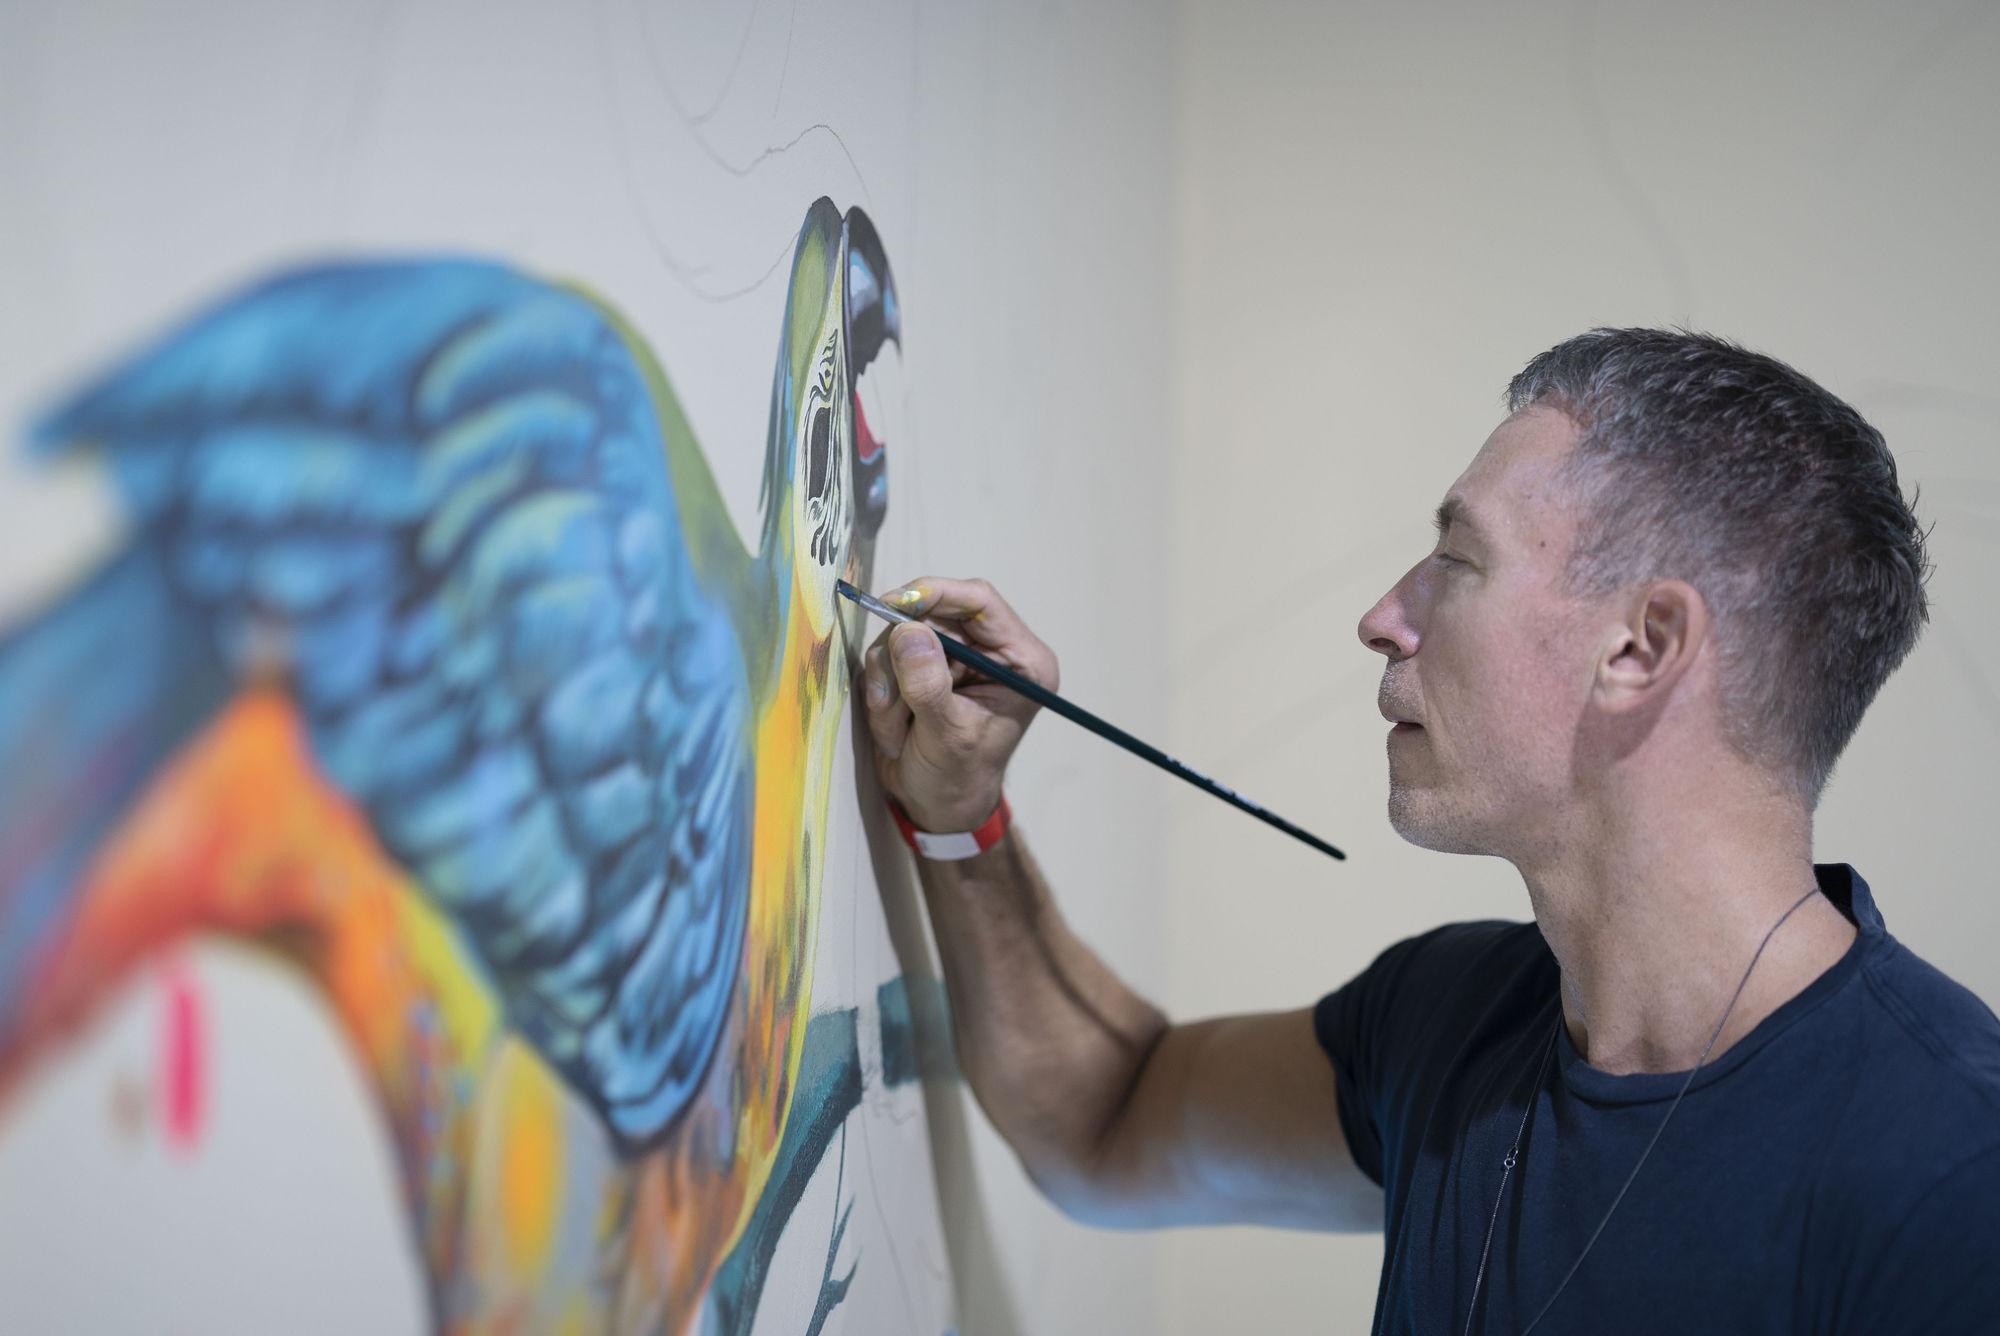 AGENT MOLLY & CO / Illustrator Olaf Hajek